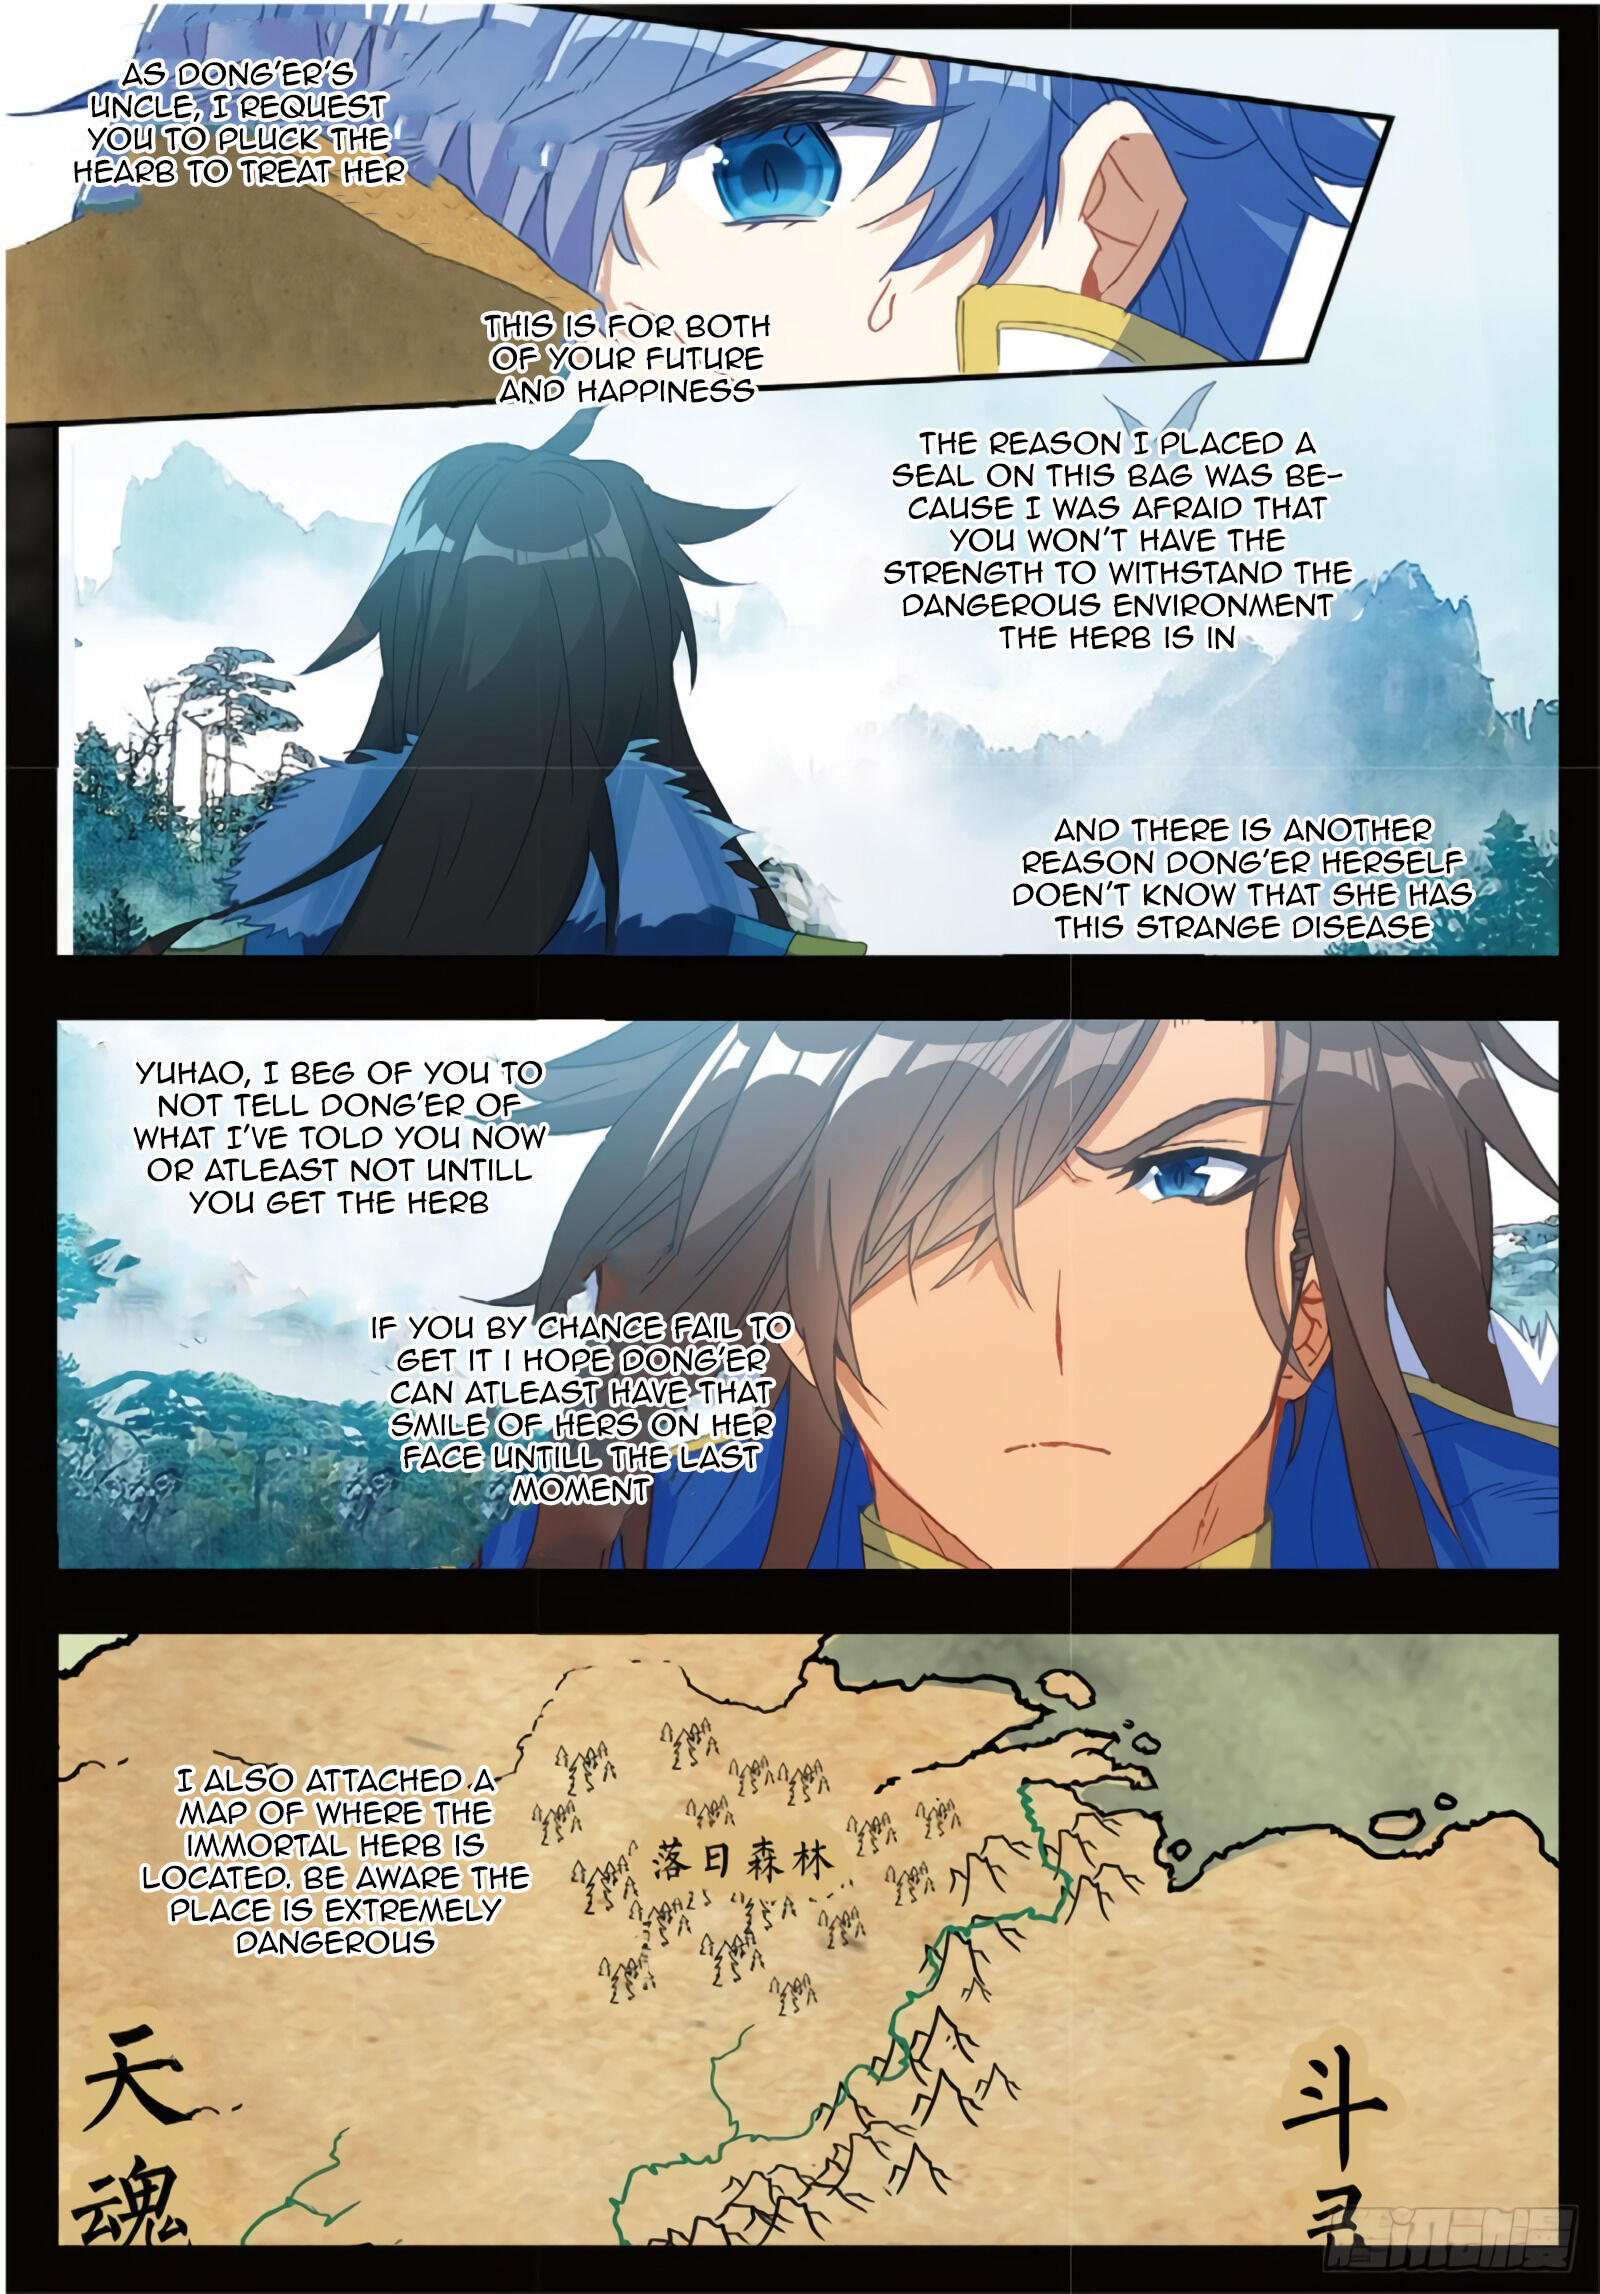 Douluo Dalu Ii - Jueshui Tangmen Chapter 283 page 6 - Mangakakalot